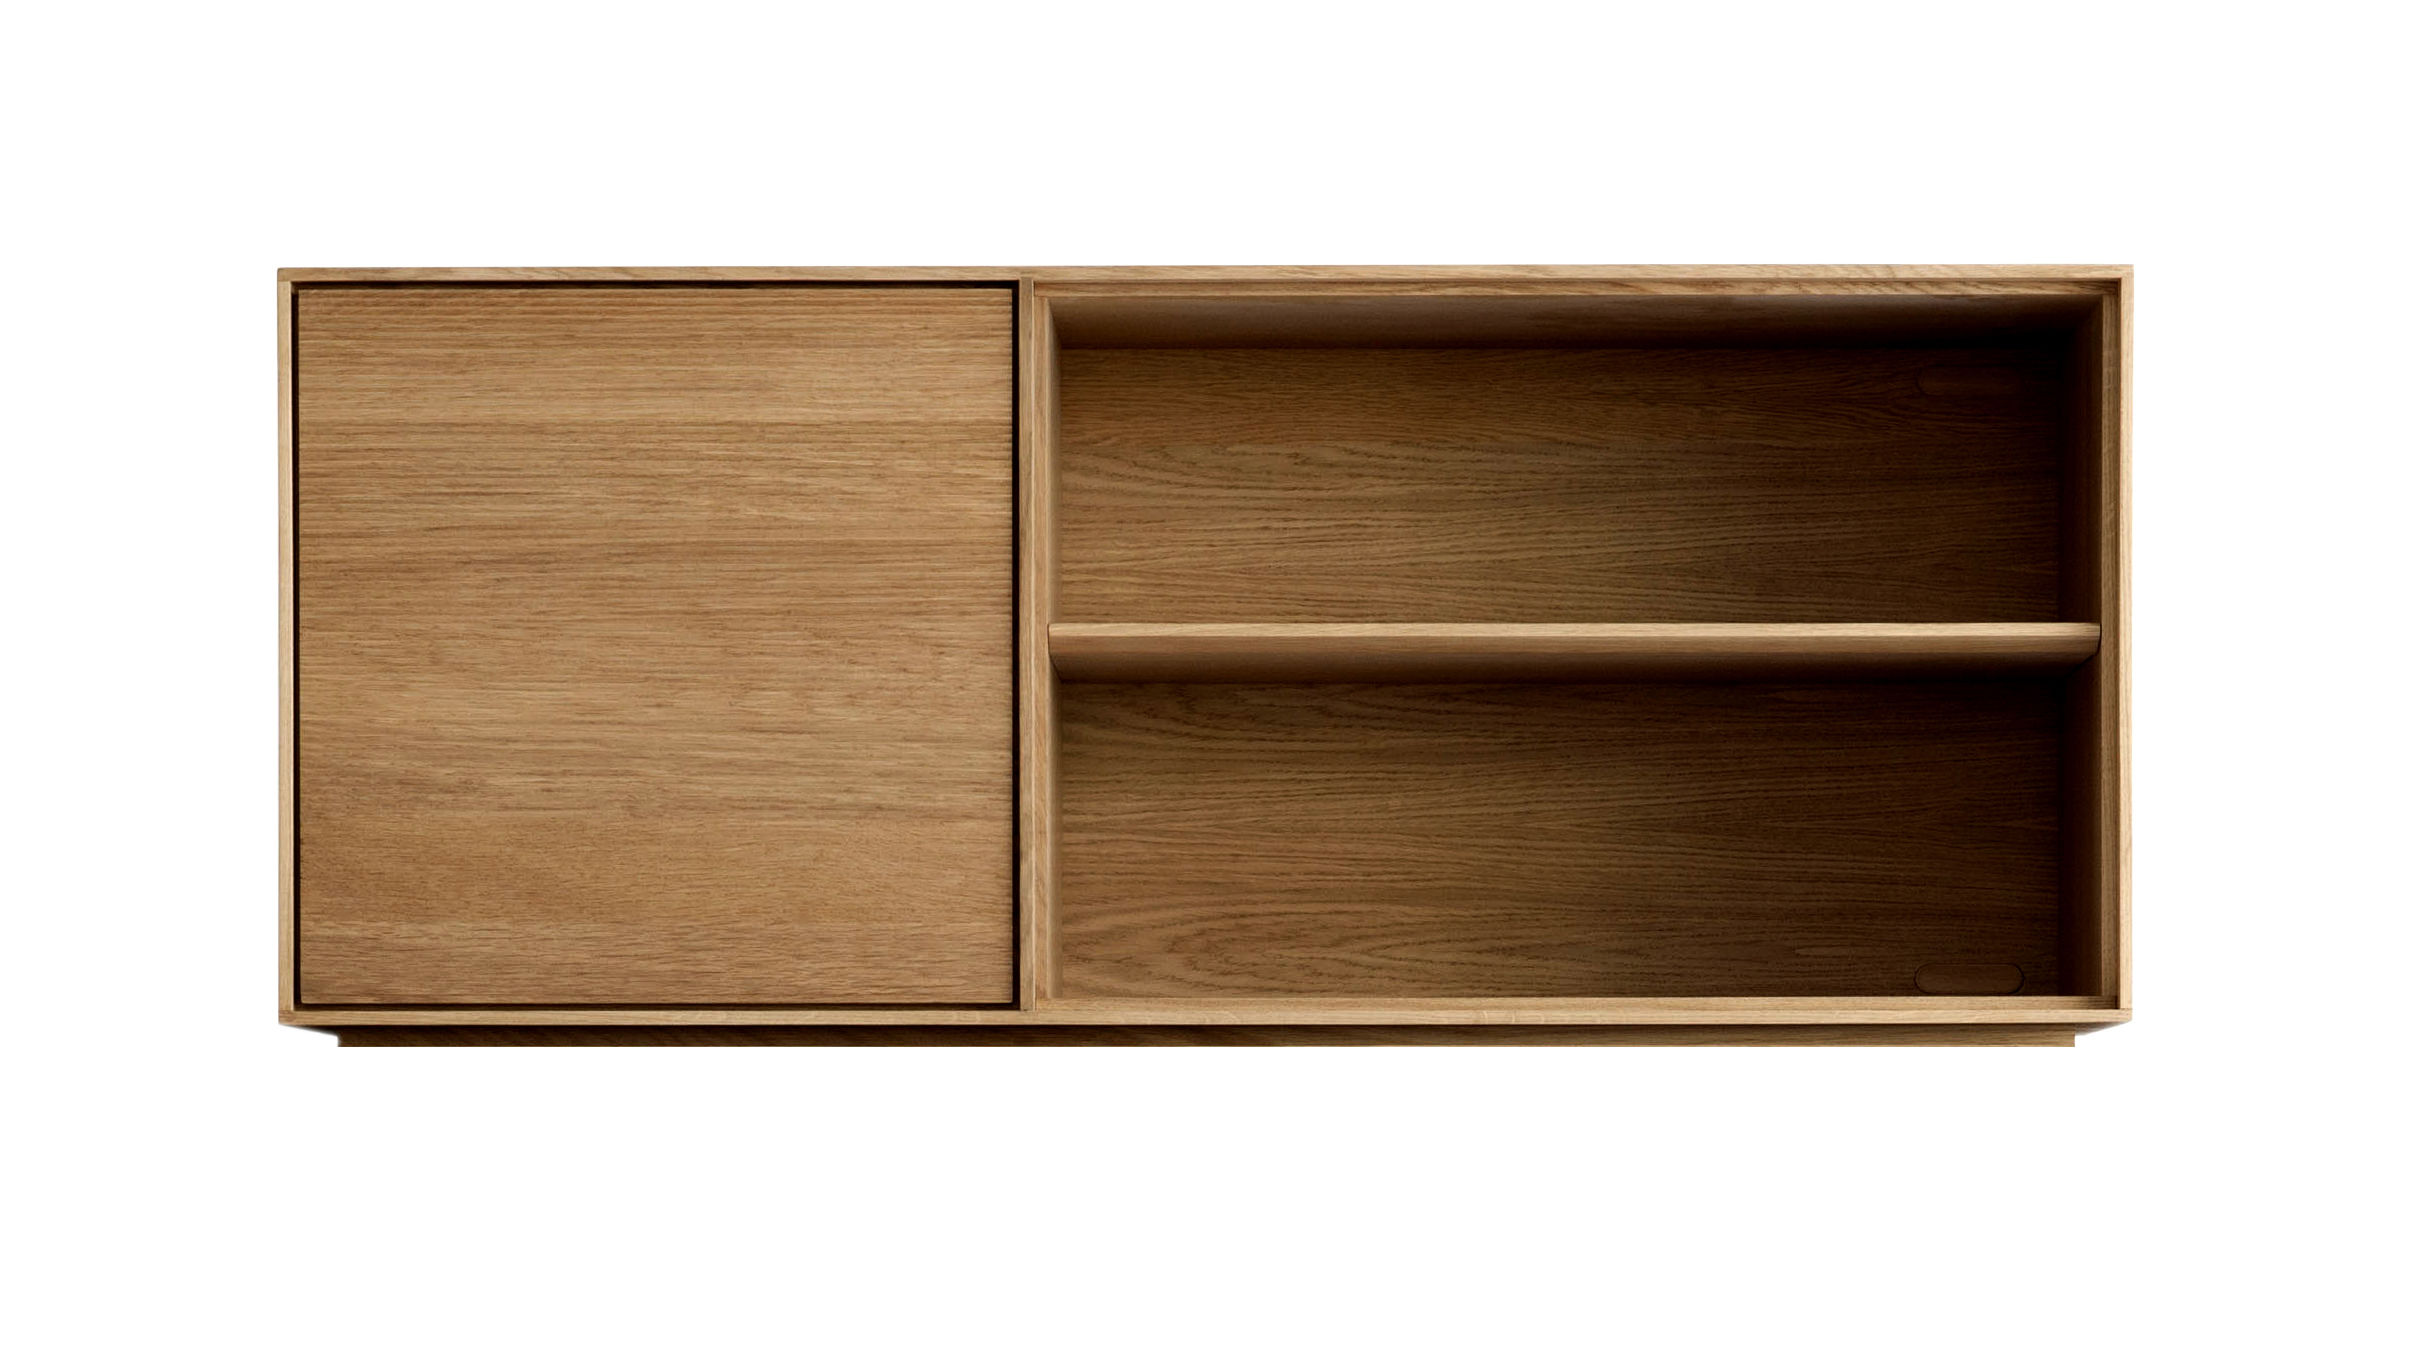 caisson empilable modulo interm diaire l 130 cm porte gauche 2 tag res position. Black Bedroom Furniture Sets. Home Design Ideas